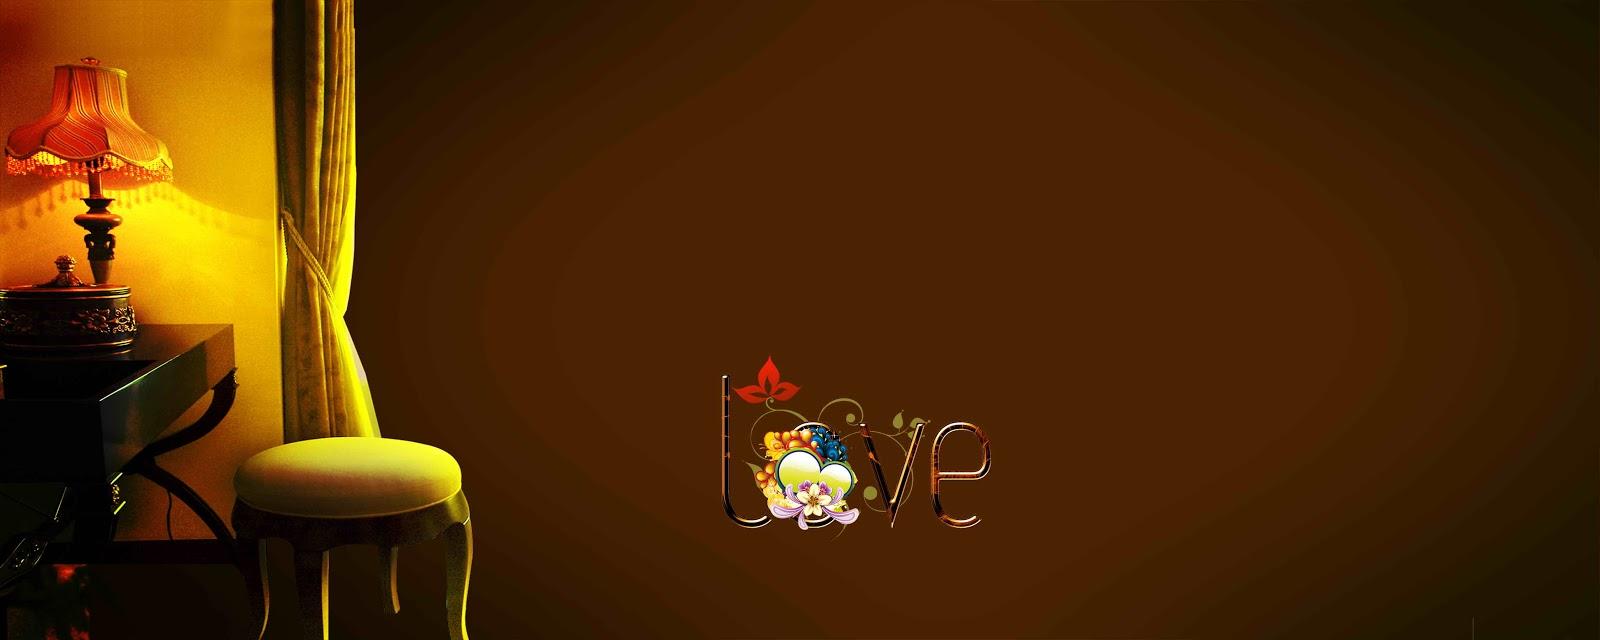 Wedding photoshop background images free download